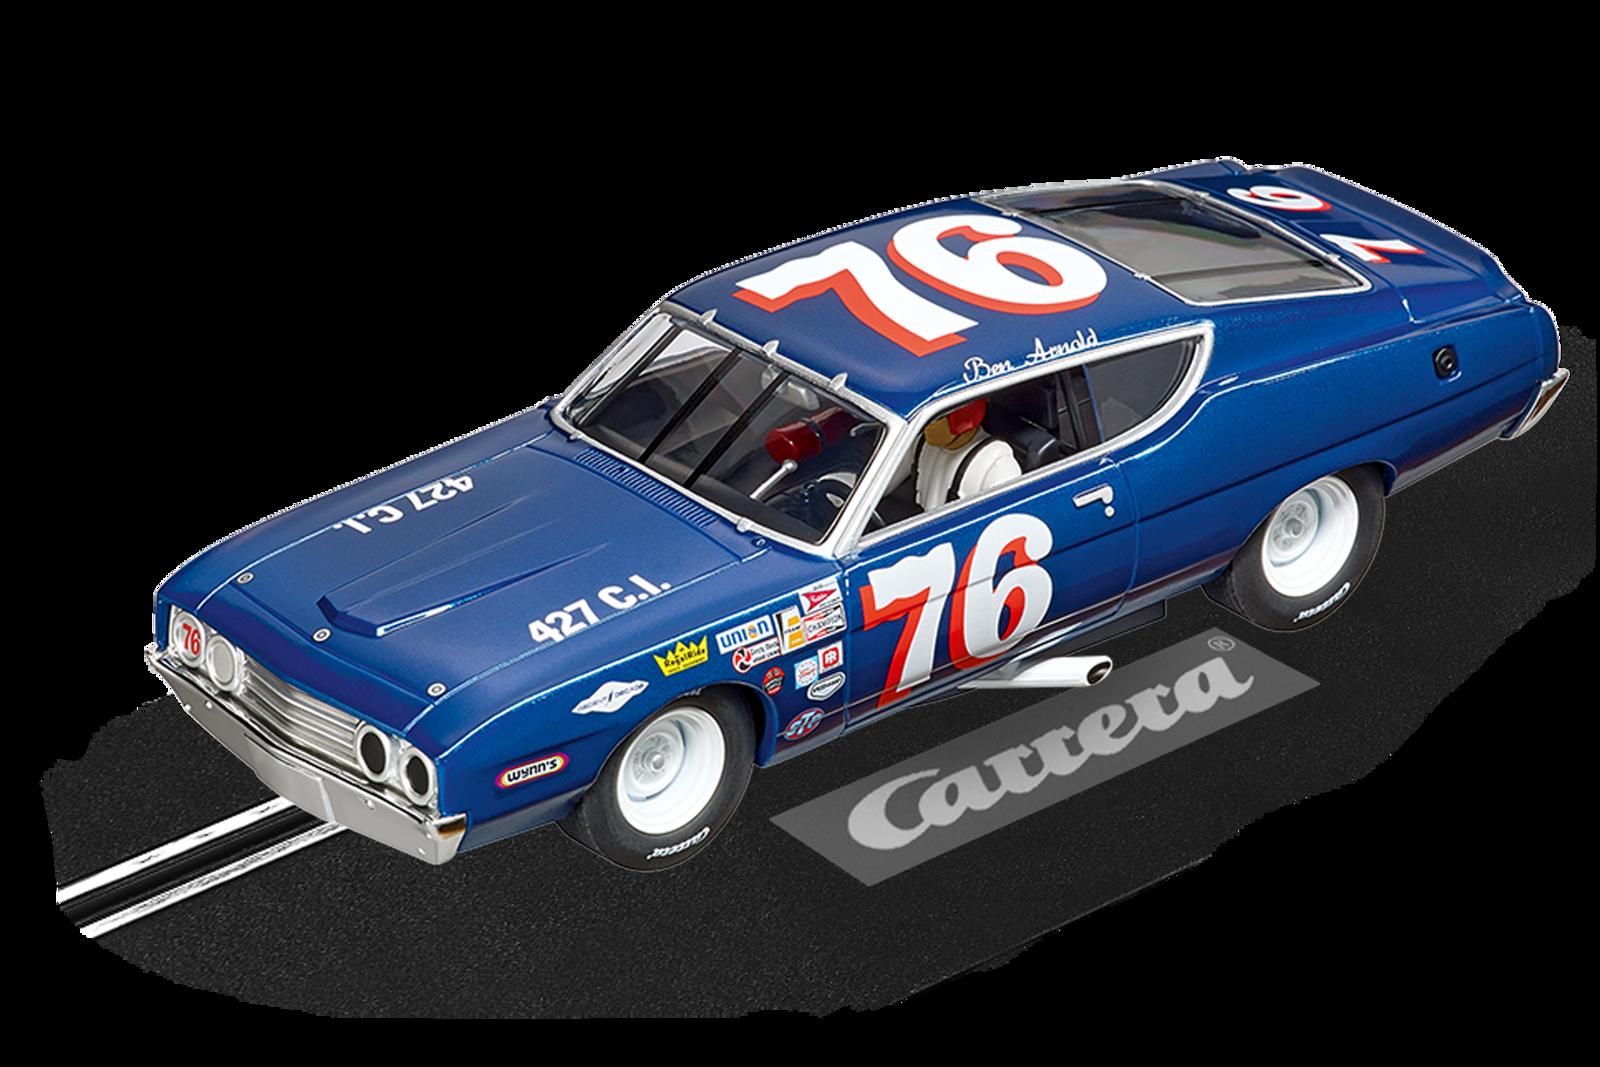 Ford Torino Talladega 1970 #76 (30907)